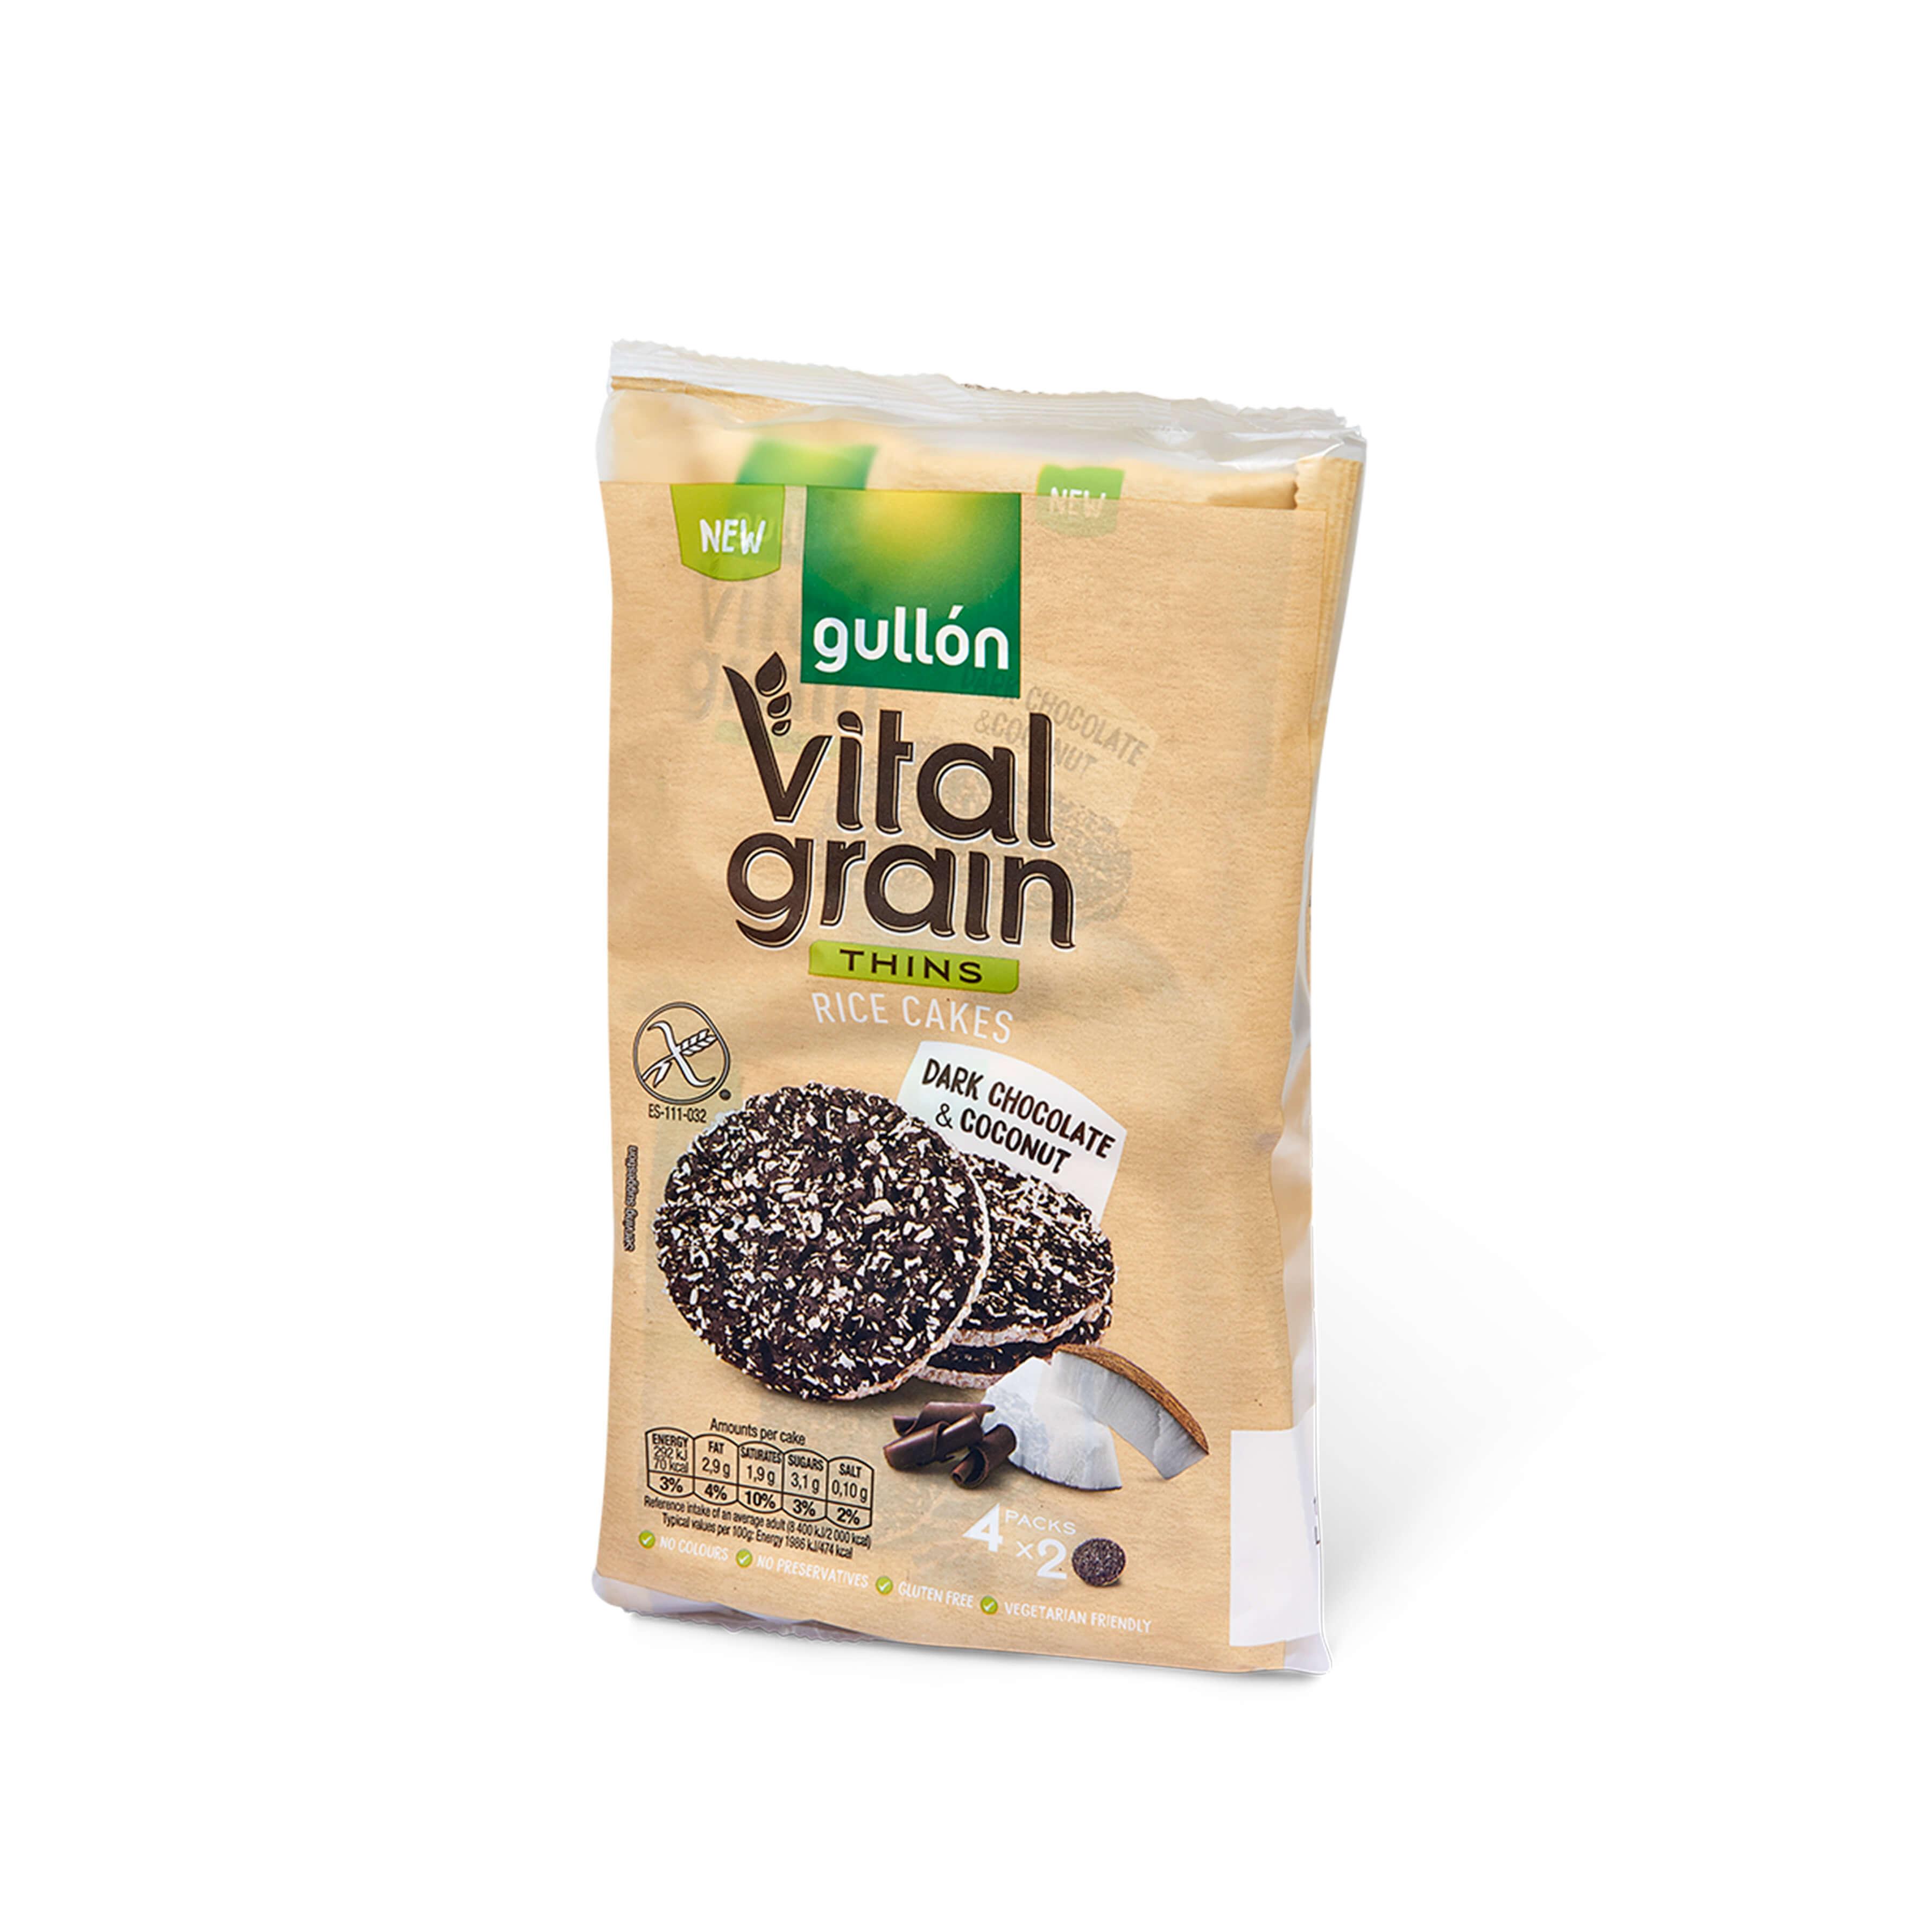 vitalgran_rice-cake_chocolate-coconut4x2_01_en